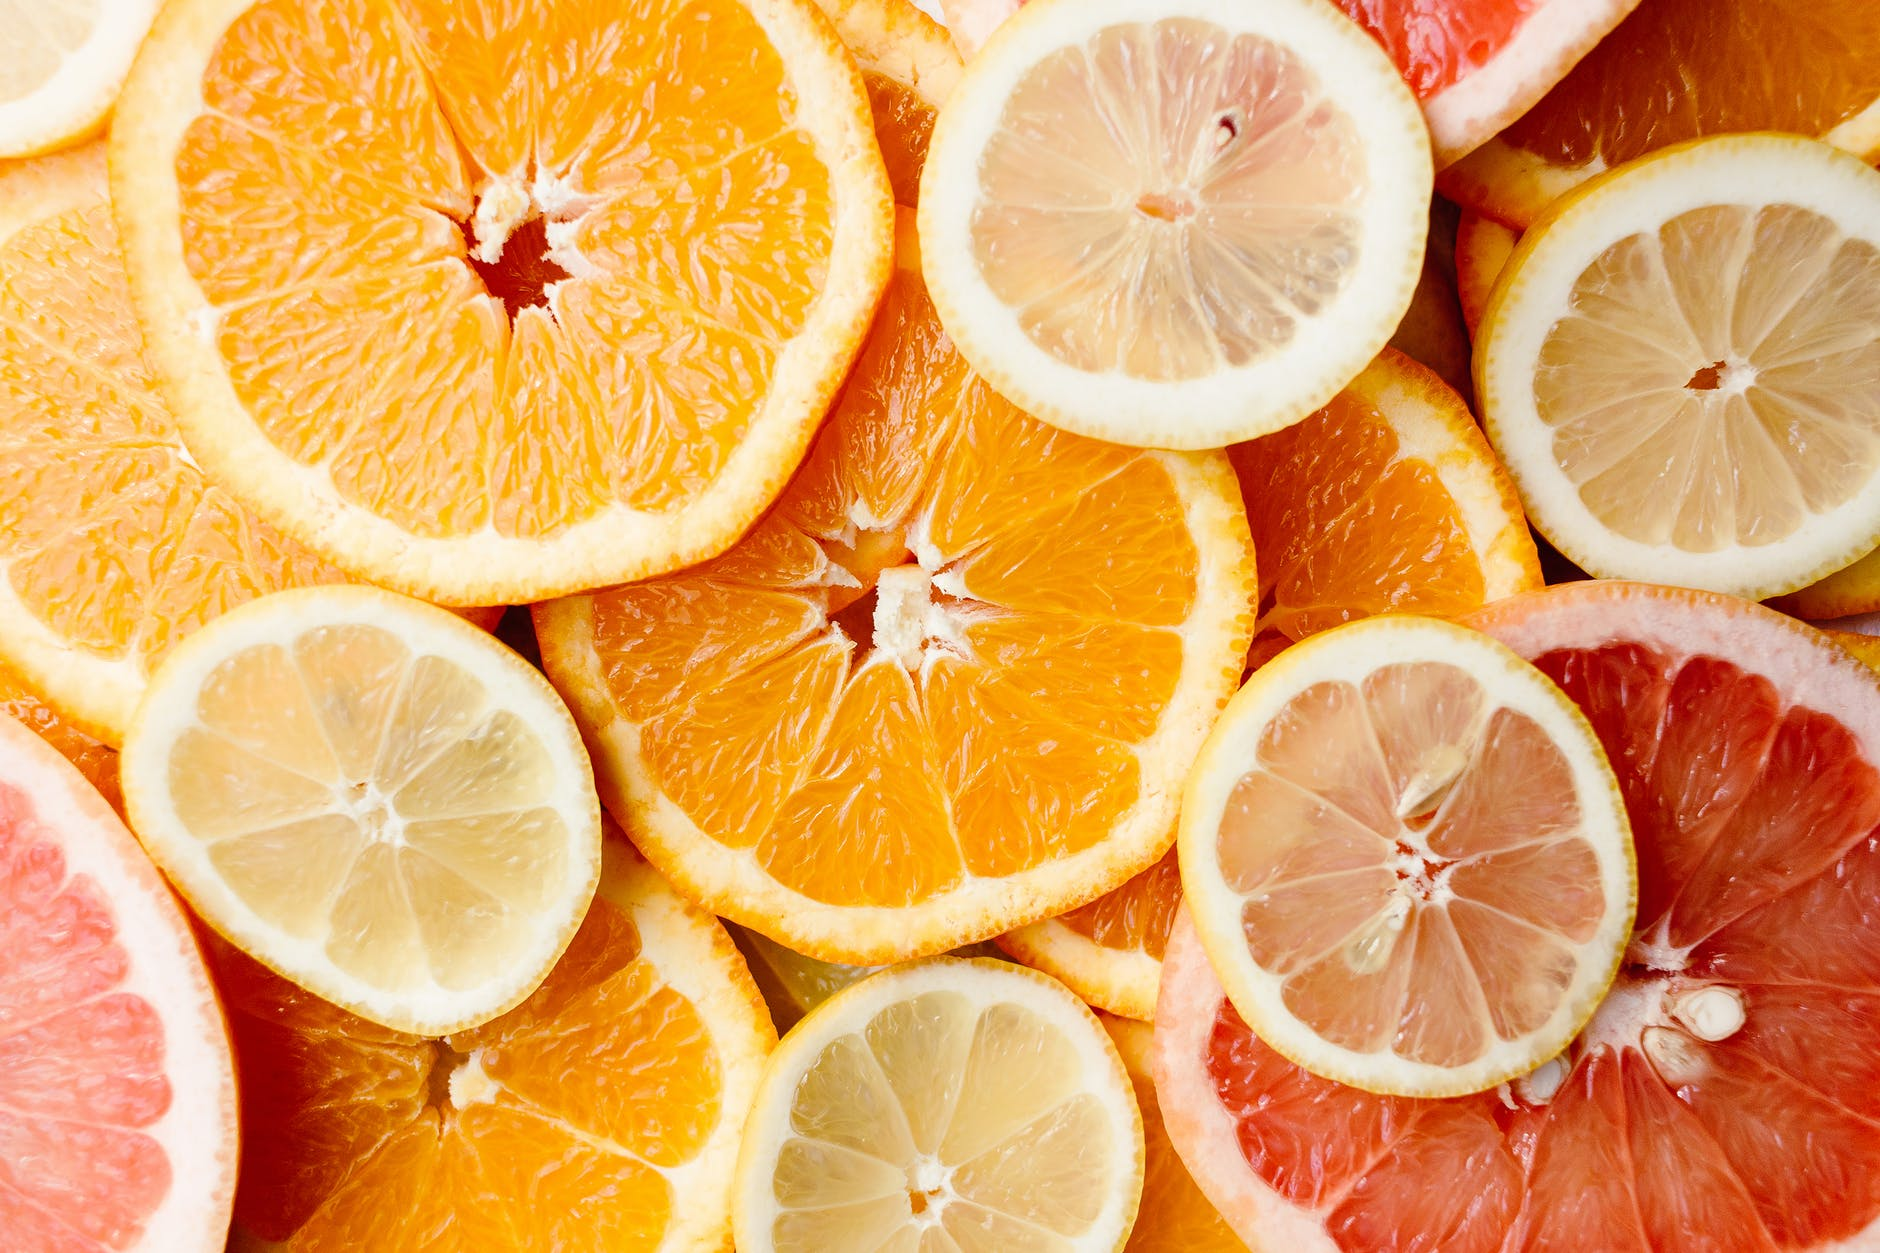 Citrus fruit as Immune Booster Food